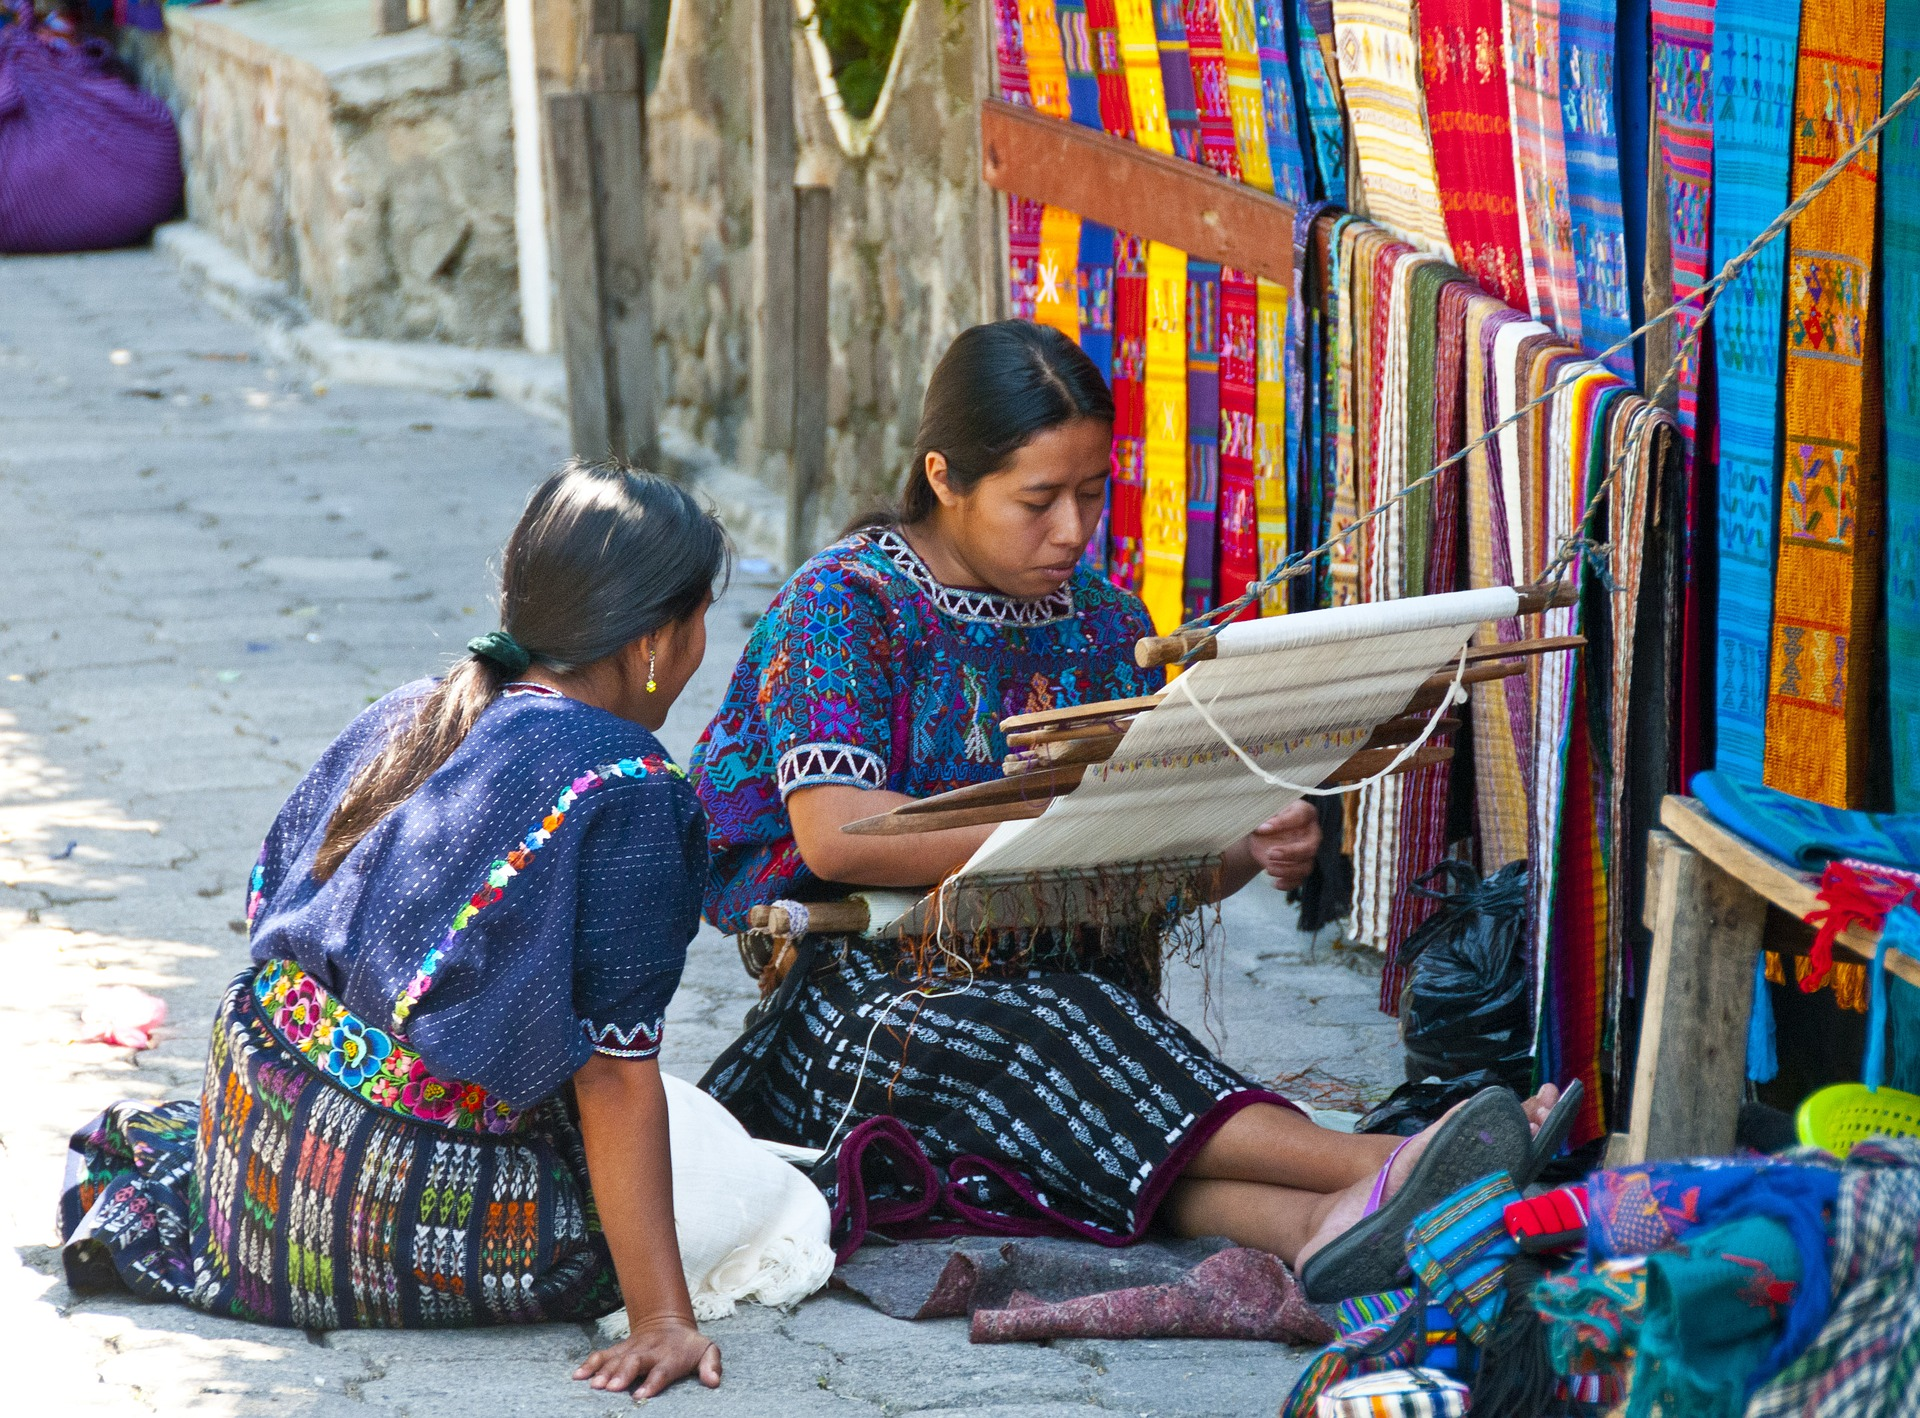 guatemala-2293062_1920.jpg